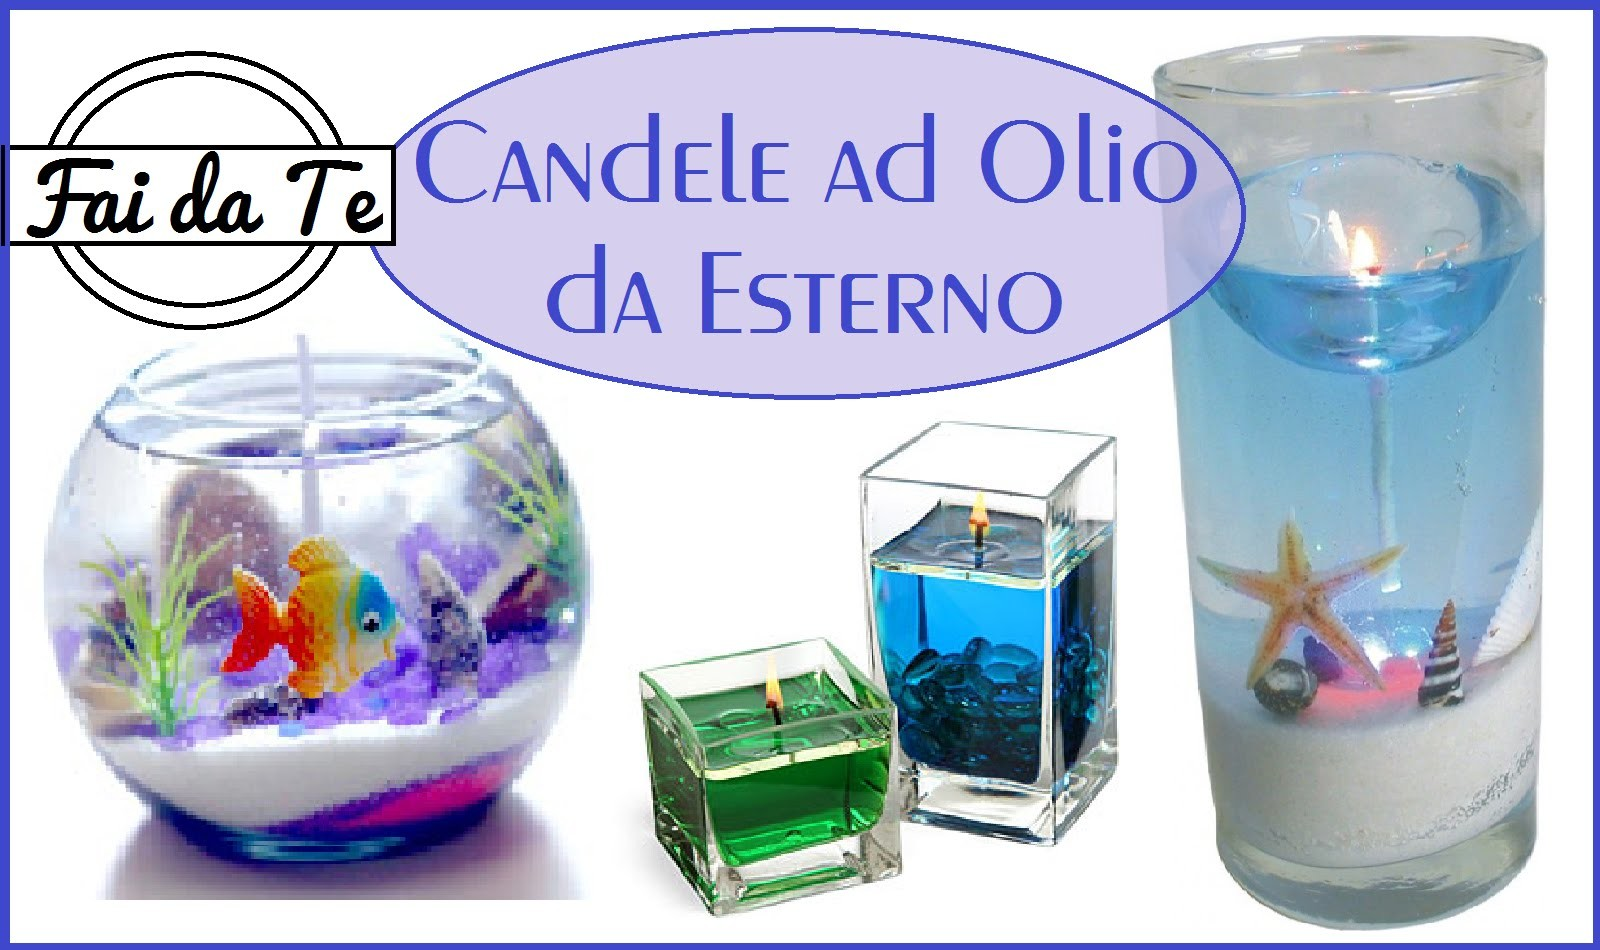 Candele ad Olio per Esterni Fai da Te - DIY Oil Candle